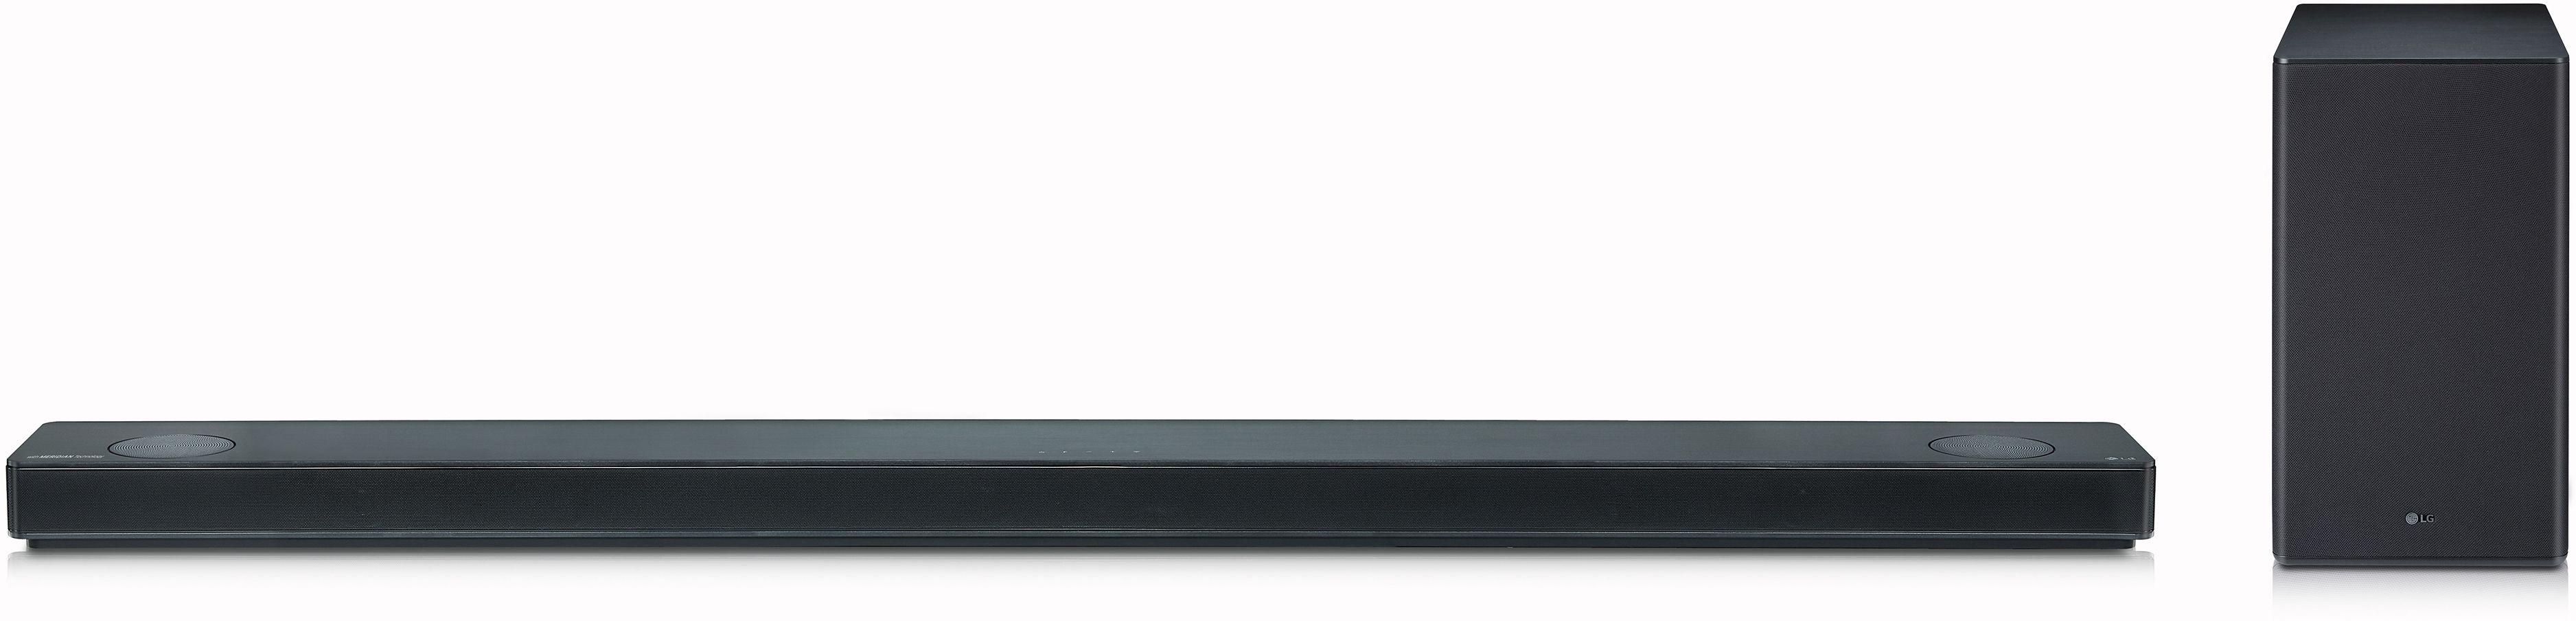 Reviews for LG 5 1 2 ch High Resolution Audio Soundbar with